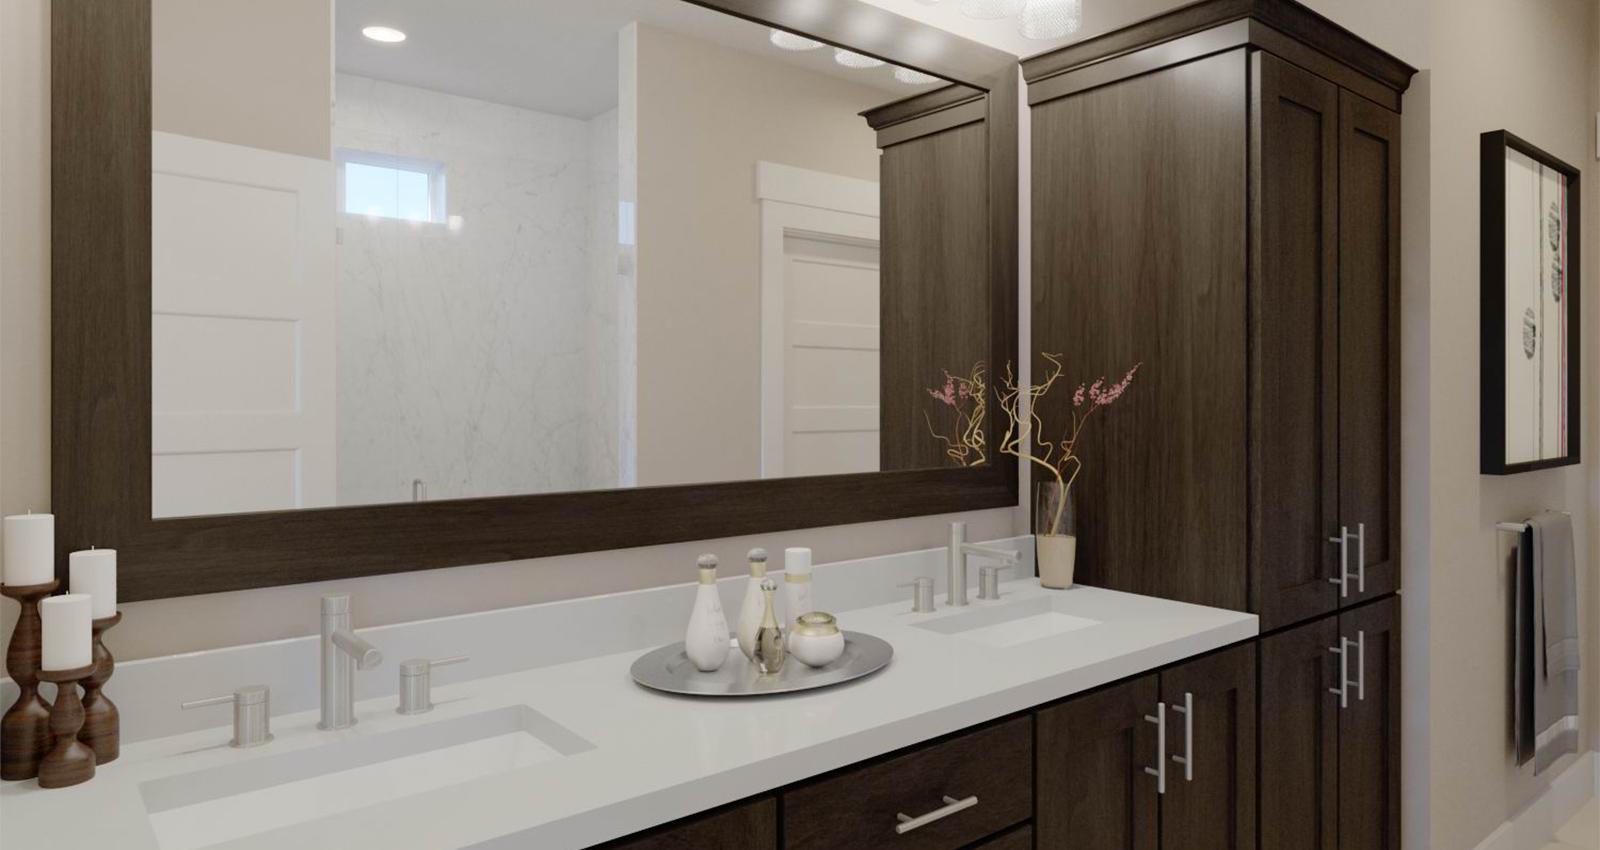 luxury bathroom with marble countertops